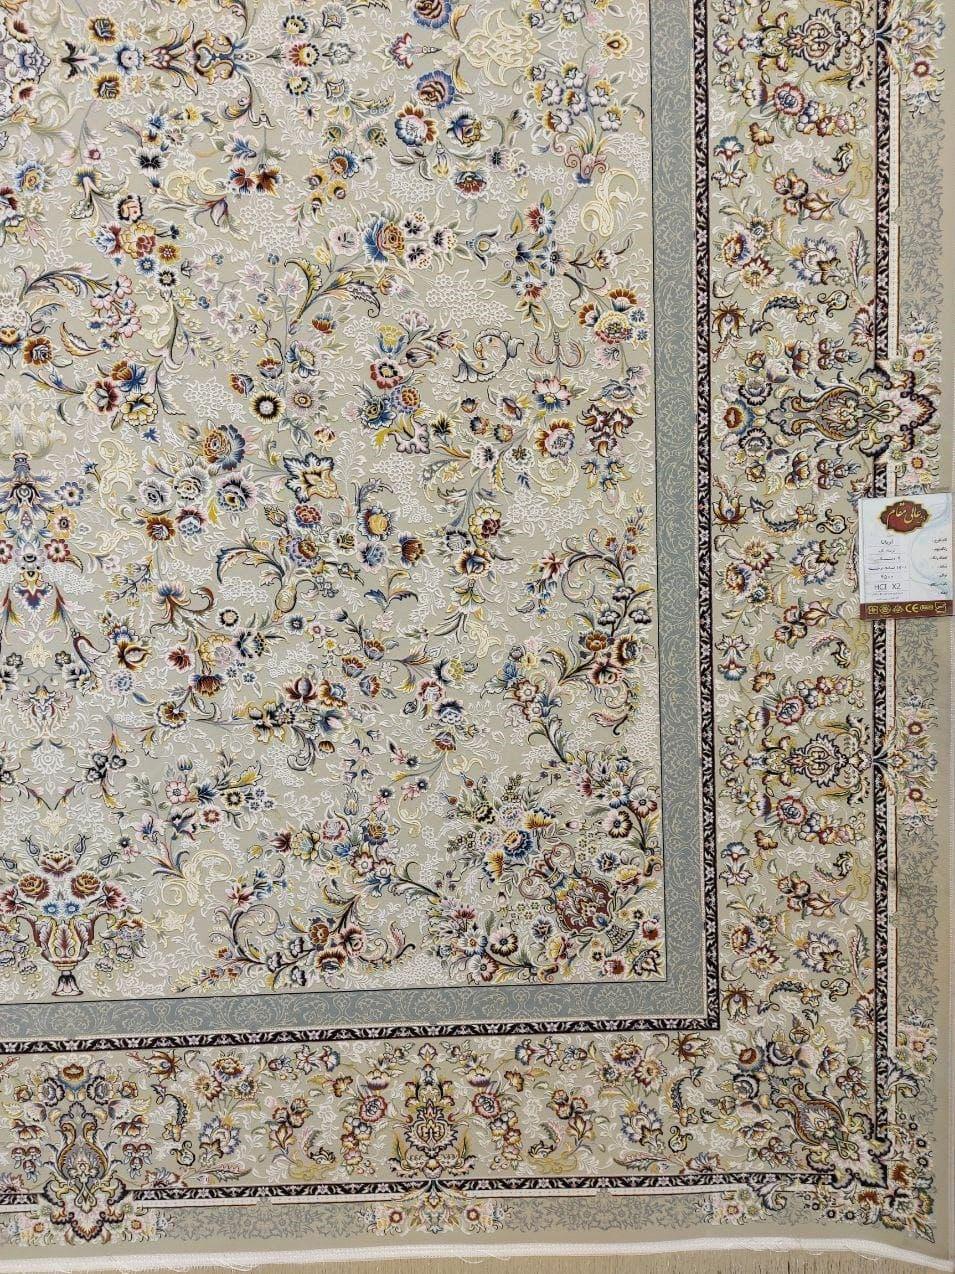 فرش 1500 شانه گل برجسته نقشه آریانا زمینه ترمه ای